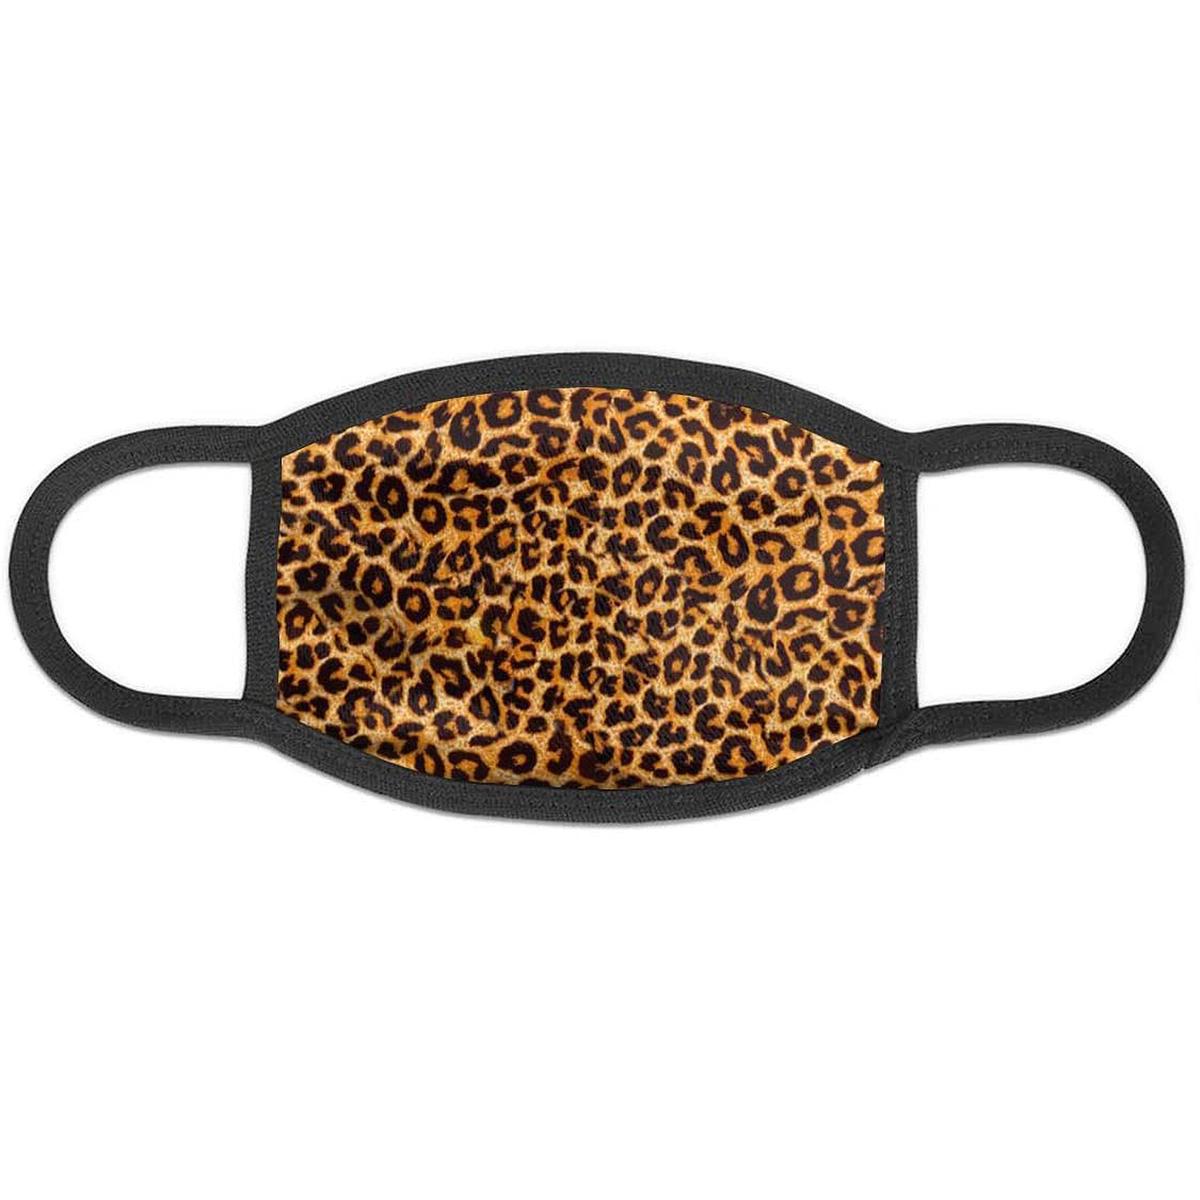 leopard-mask